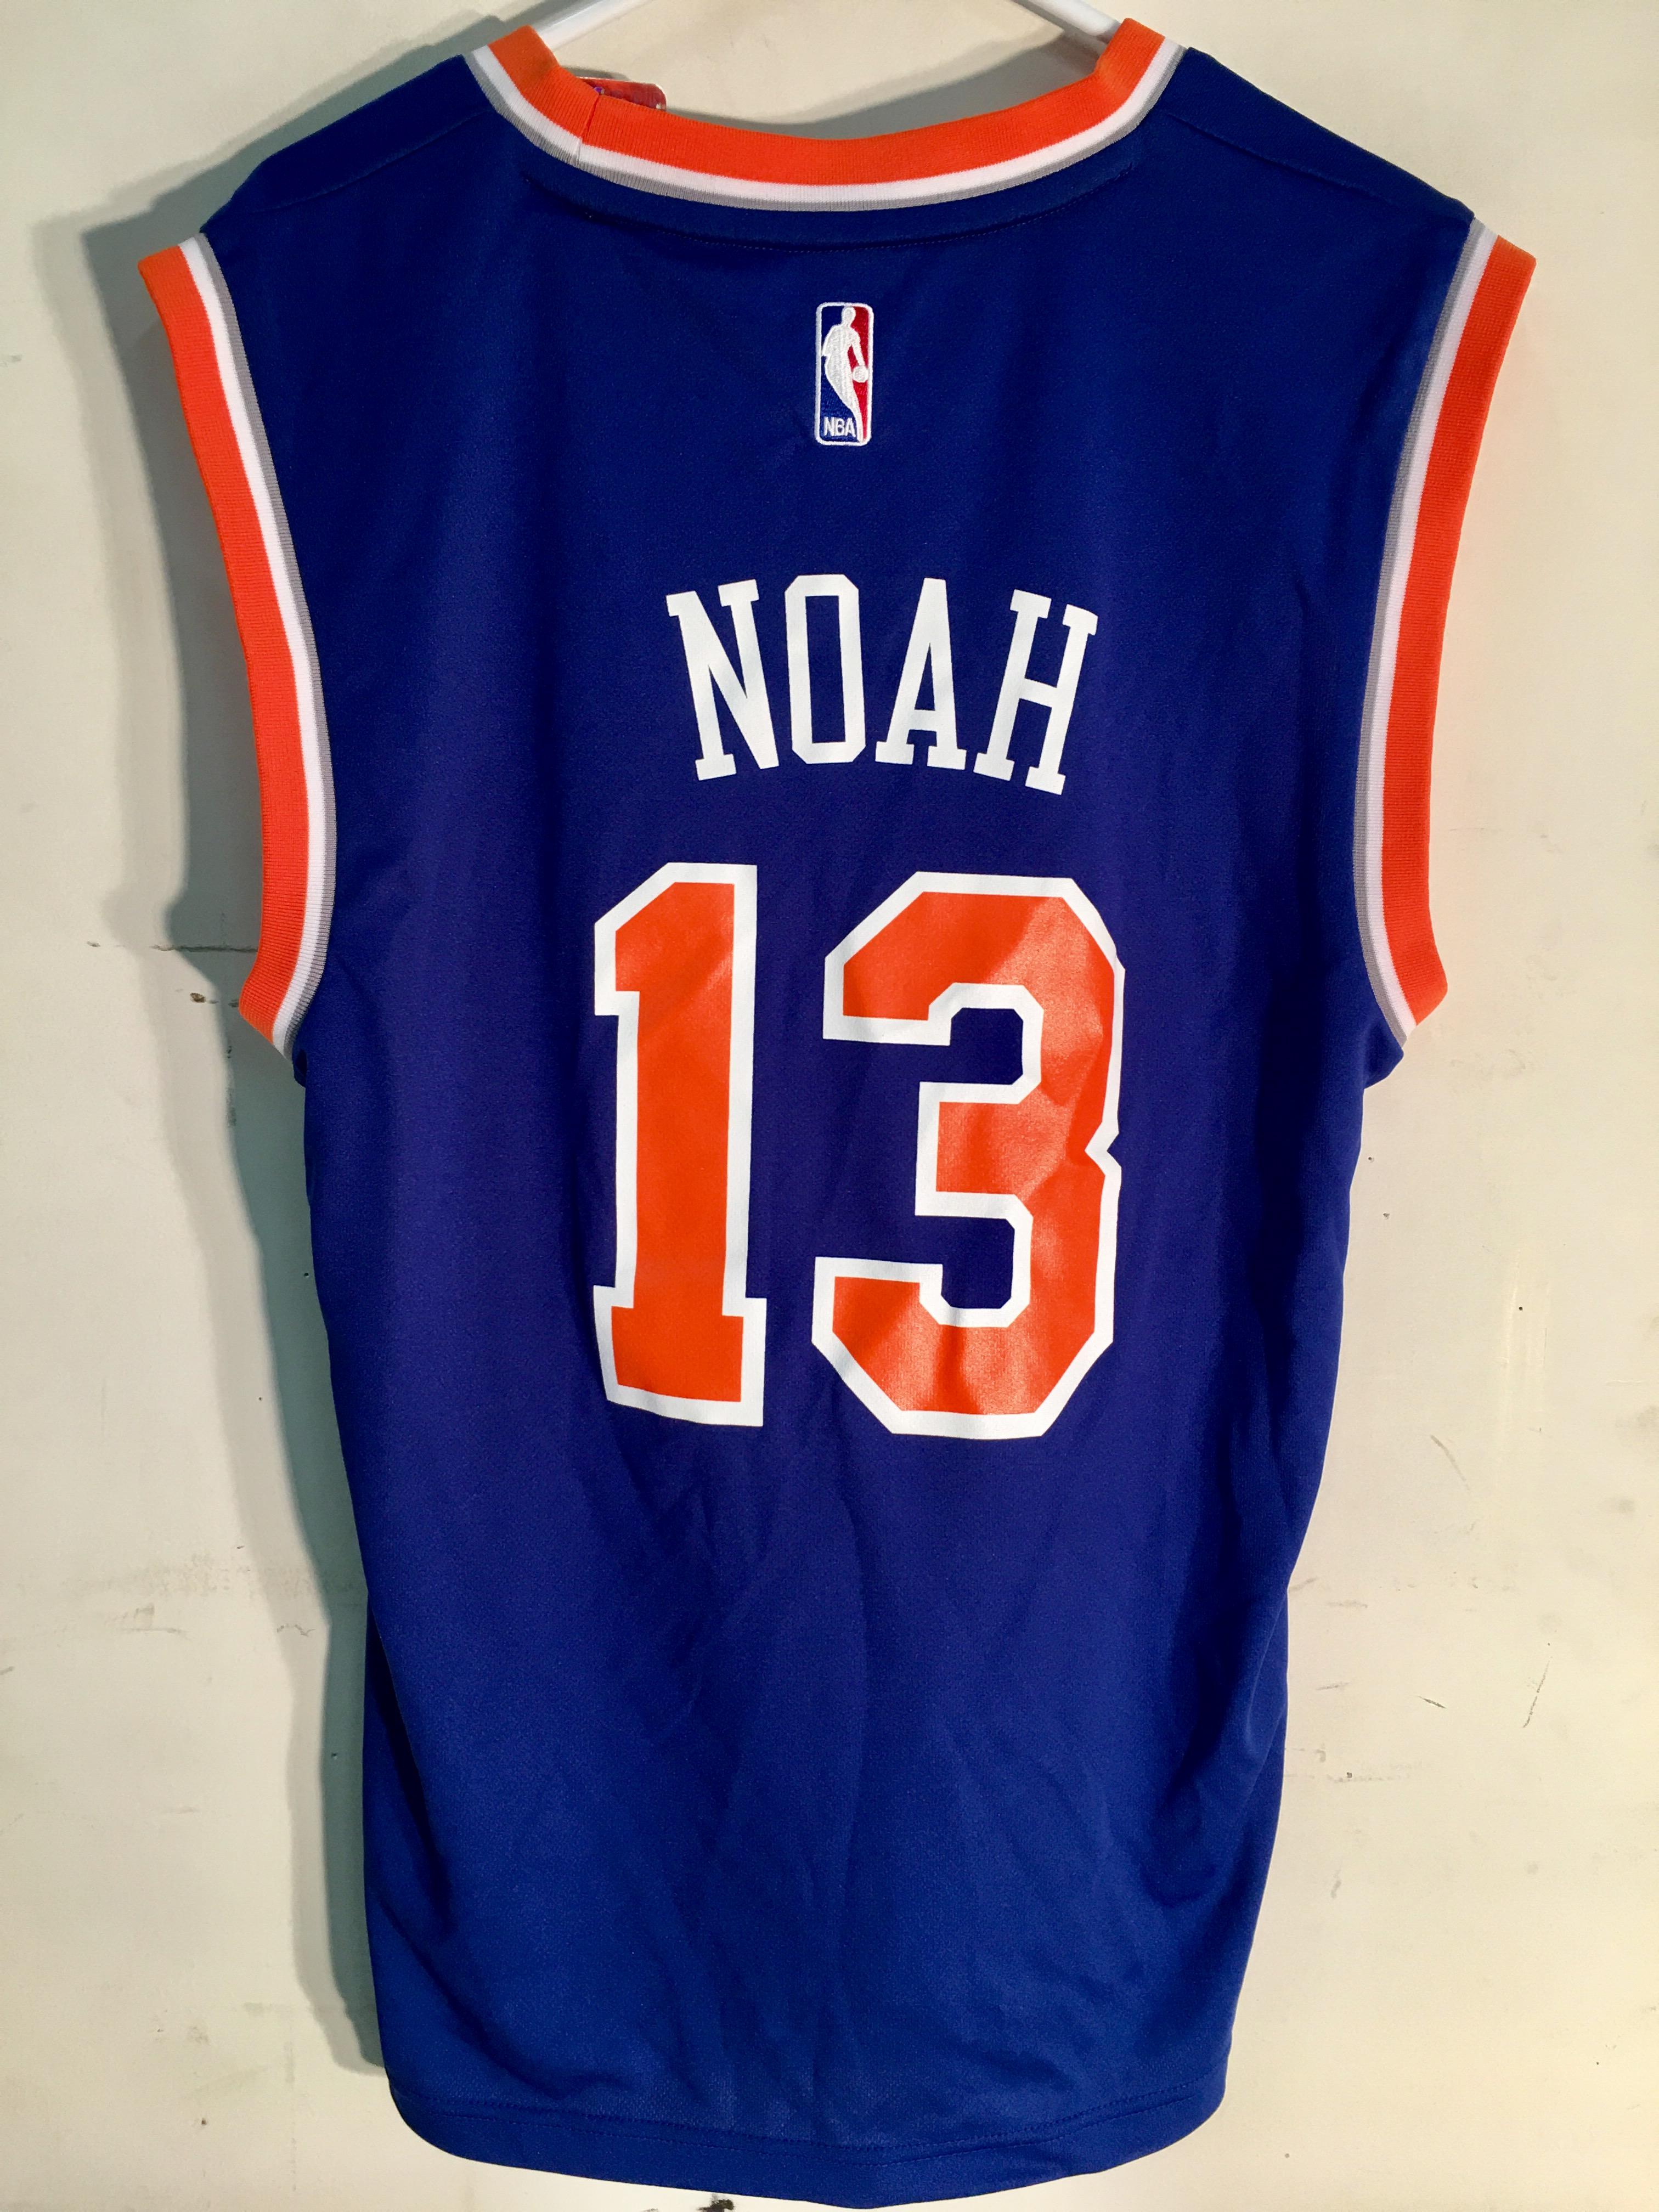 bde06fbd4570 Details about Adidas NBA Jersey New York Knicks Joakim Noah Blue sz XL